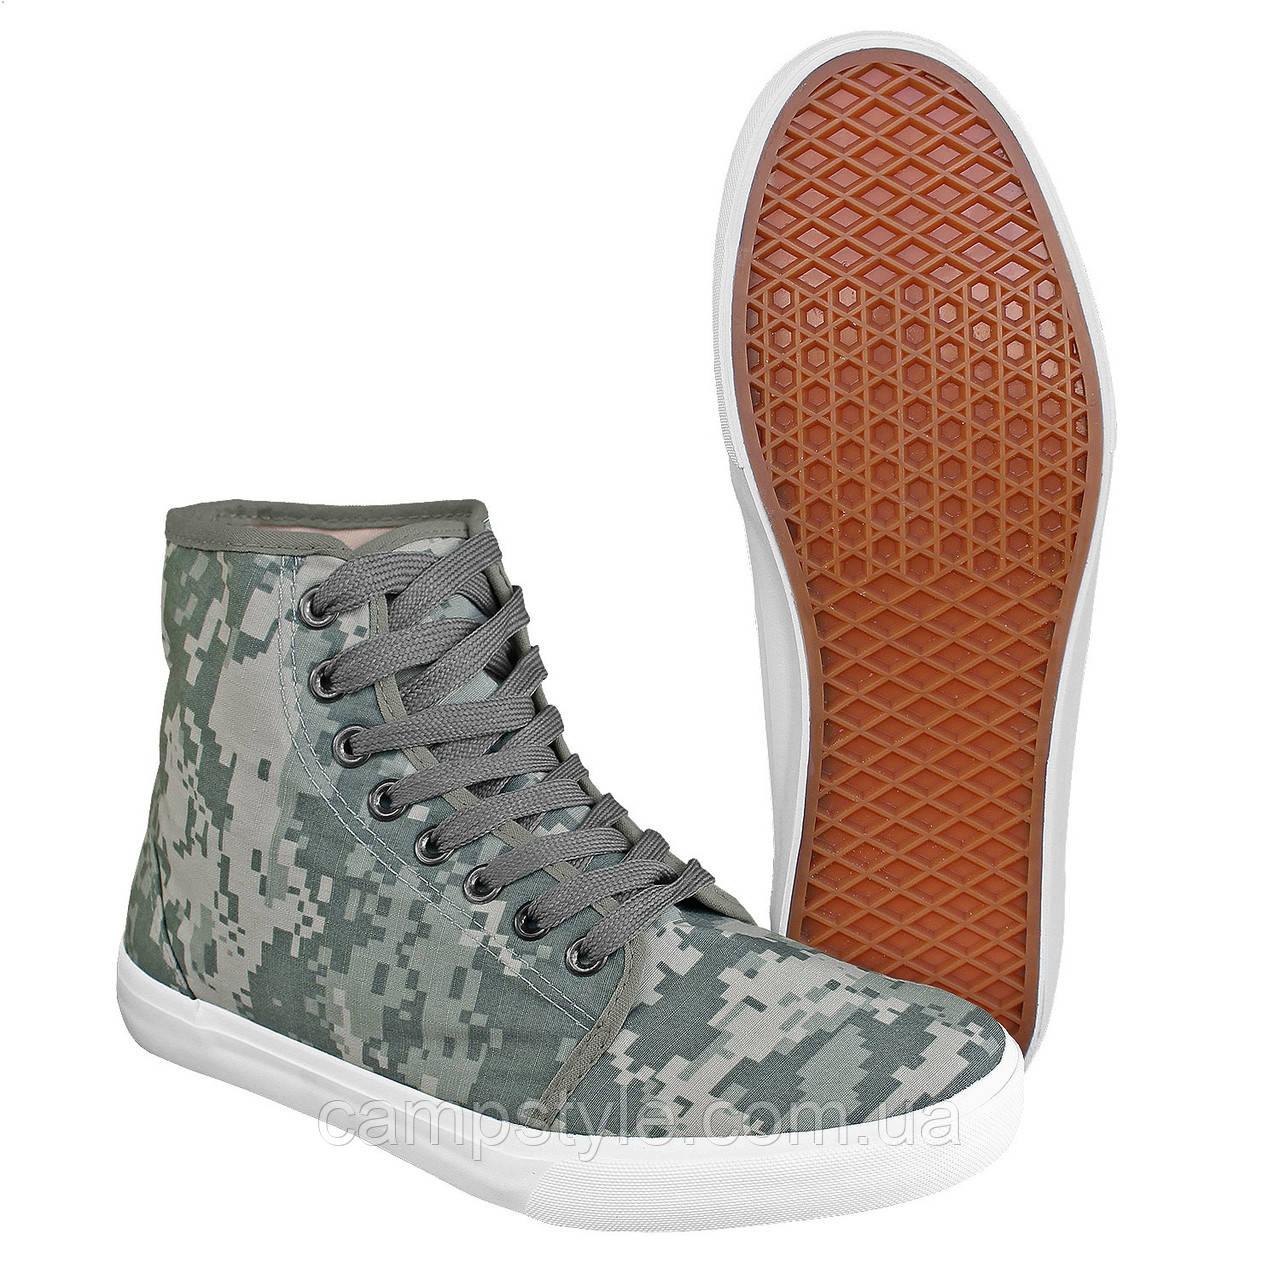 Кеды Mil-tec At-Digital Army Sneaker